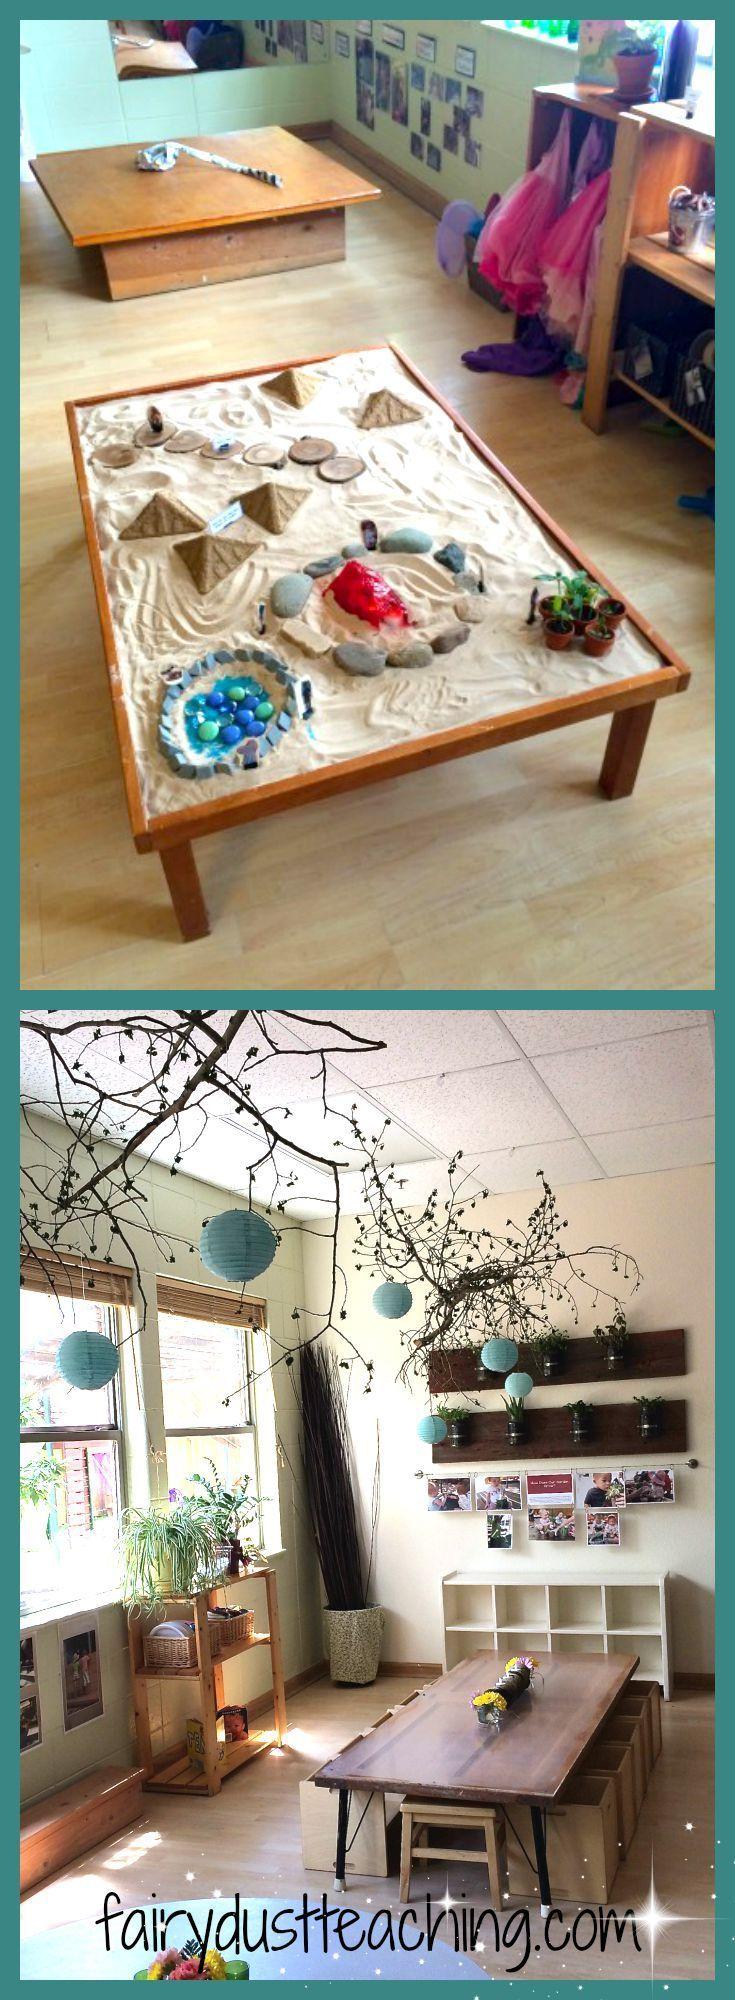 Boulder Journey School Reggio inspired classrooms, Fairy